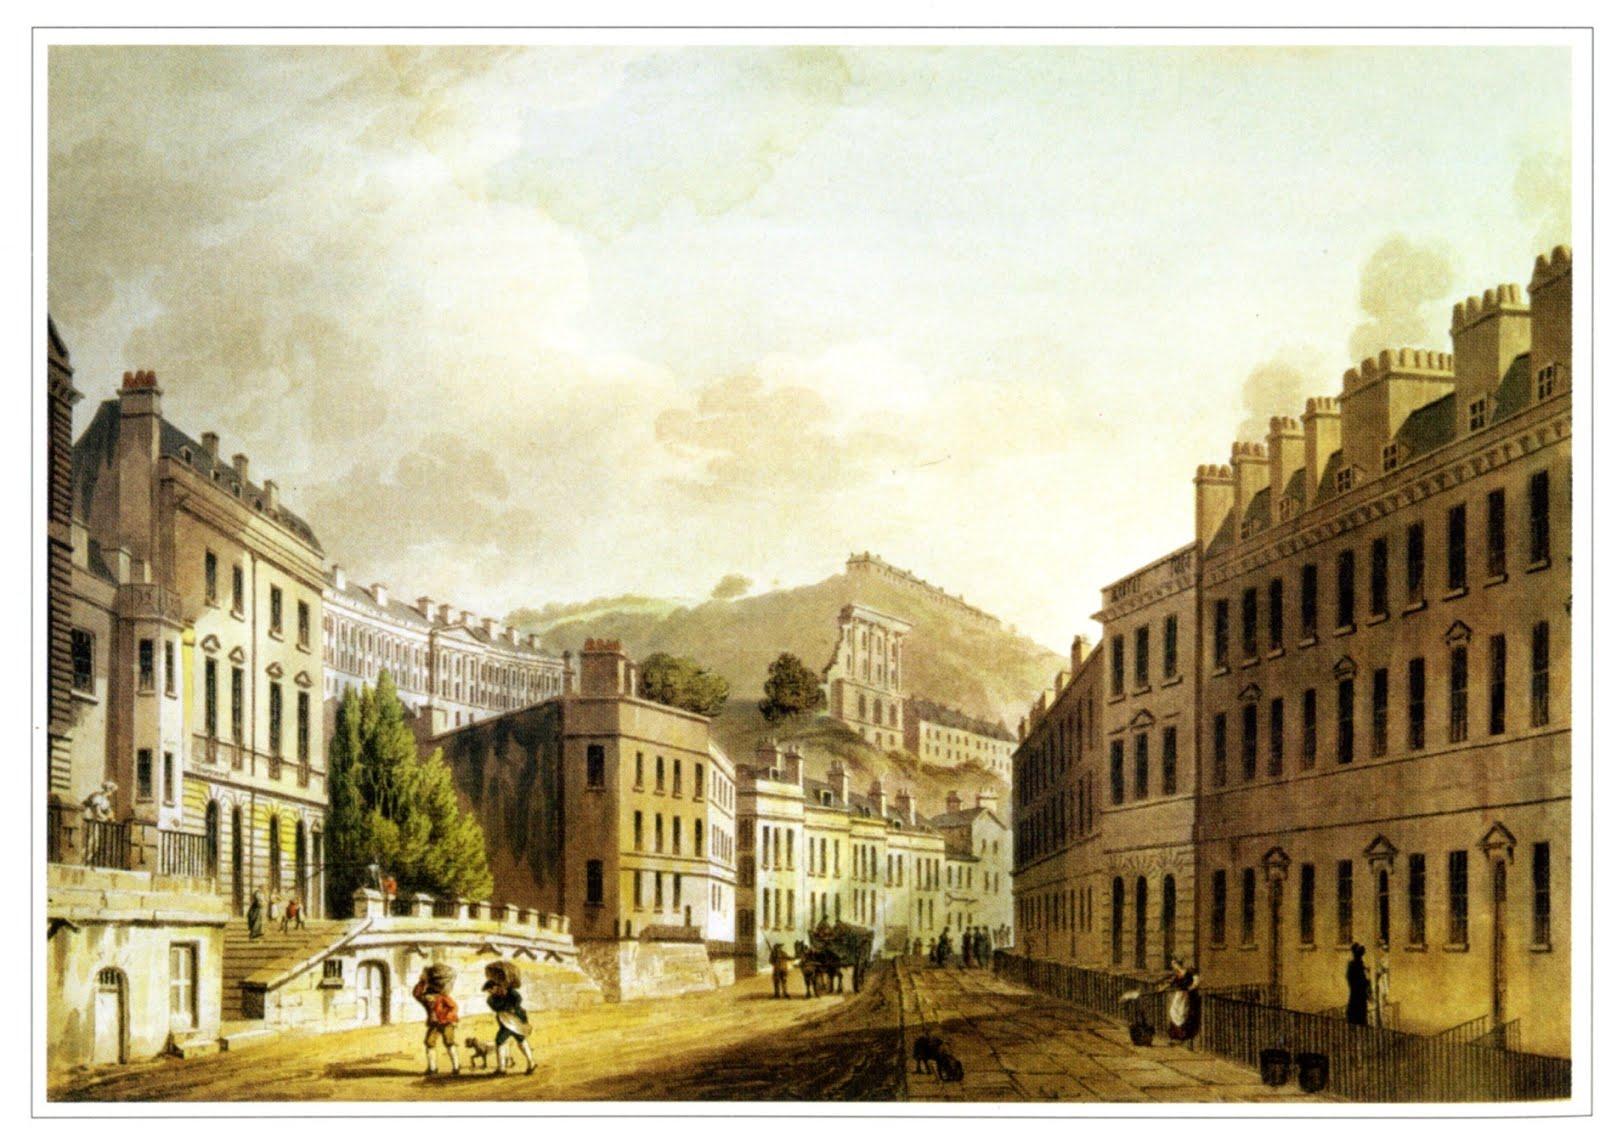 Aniversario Austen